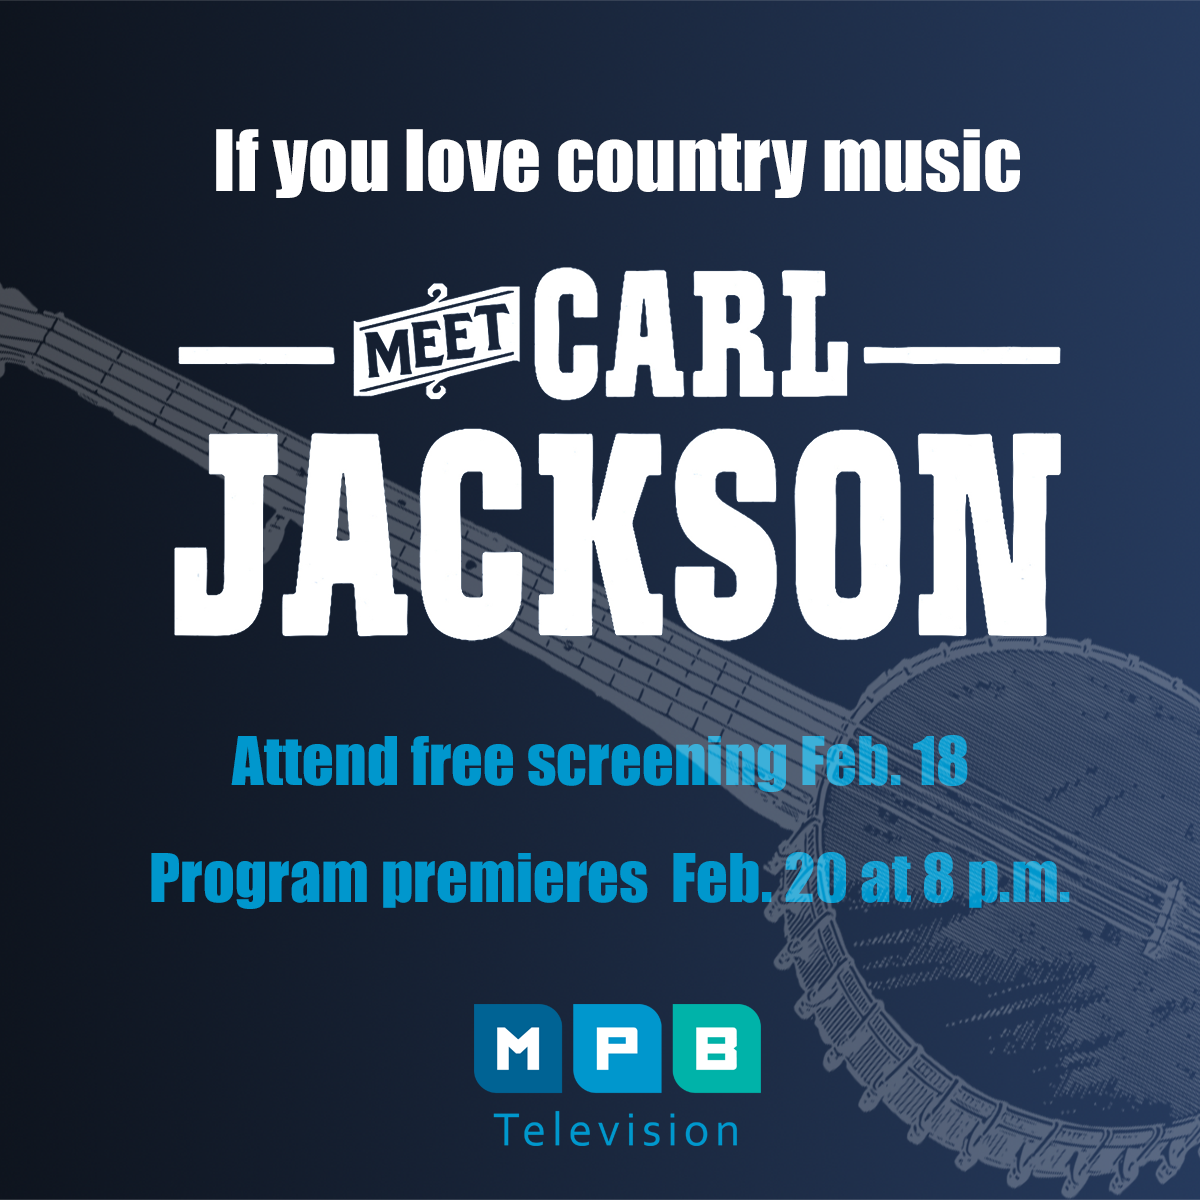 Meet Carl Jackson